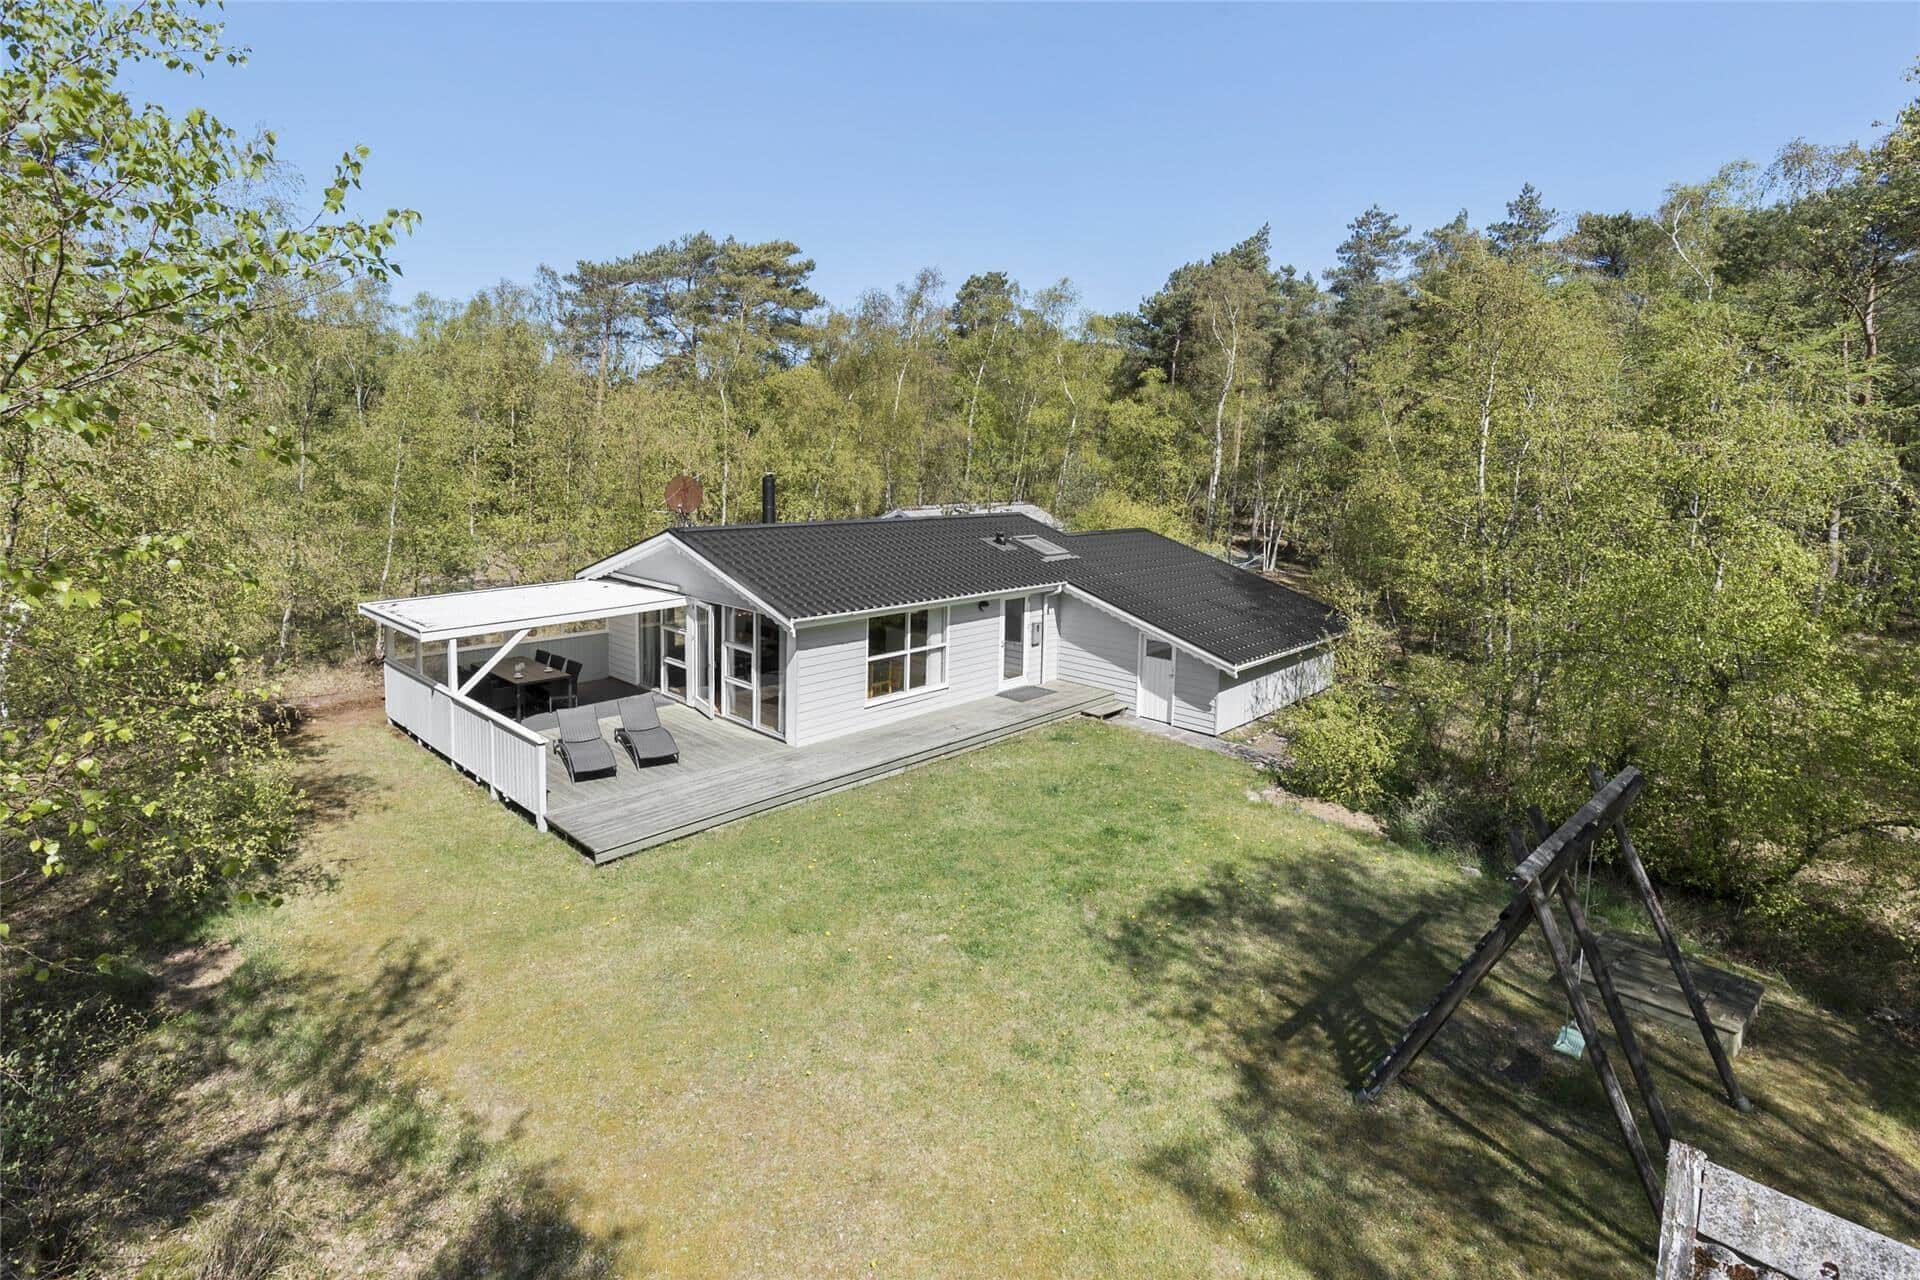 Billede 1-10 Sommerhus 2684, Strandbyskoven 9, DK - 3730 Nexø